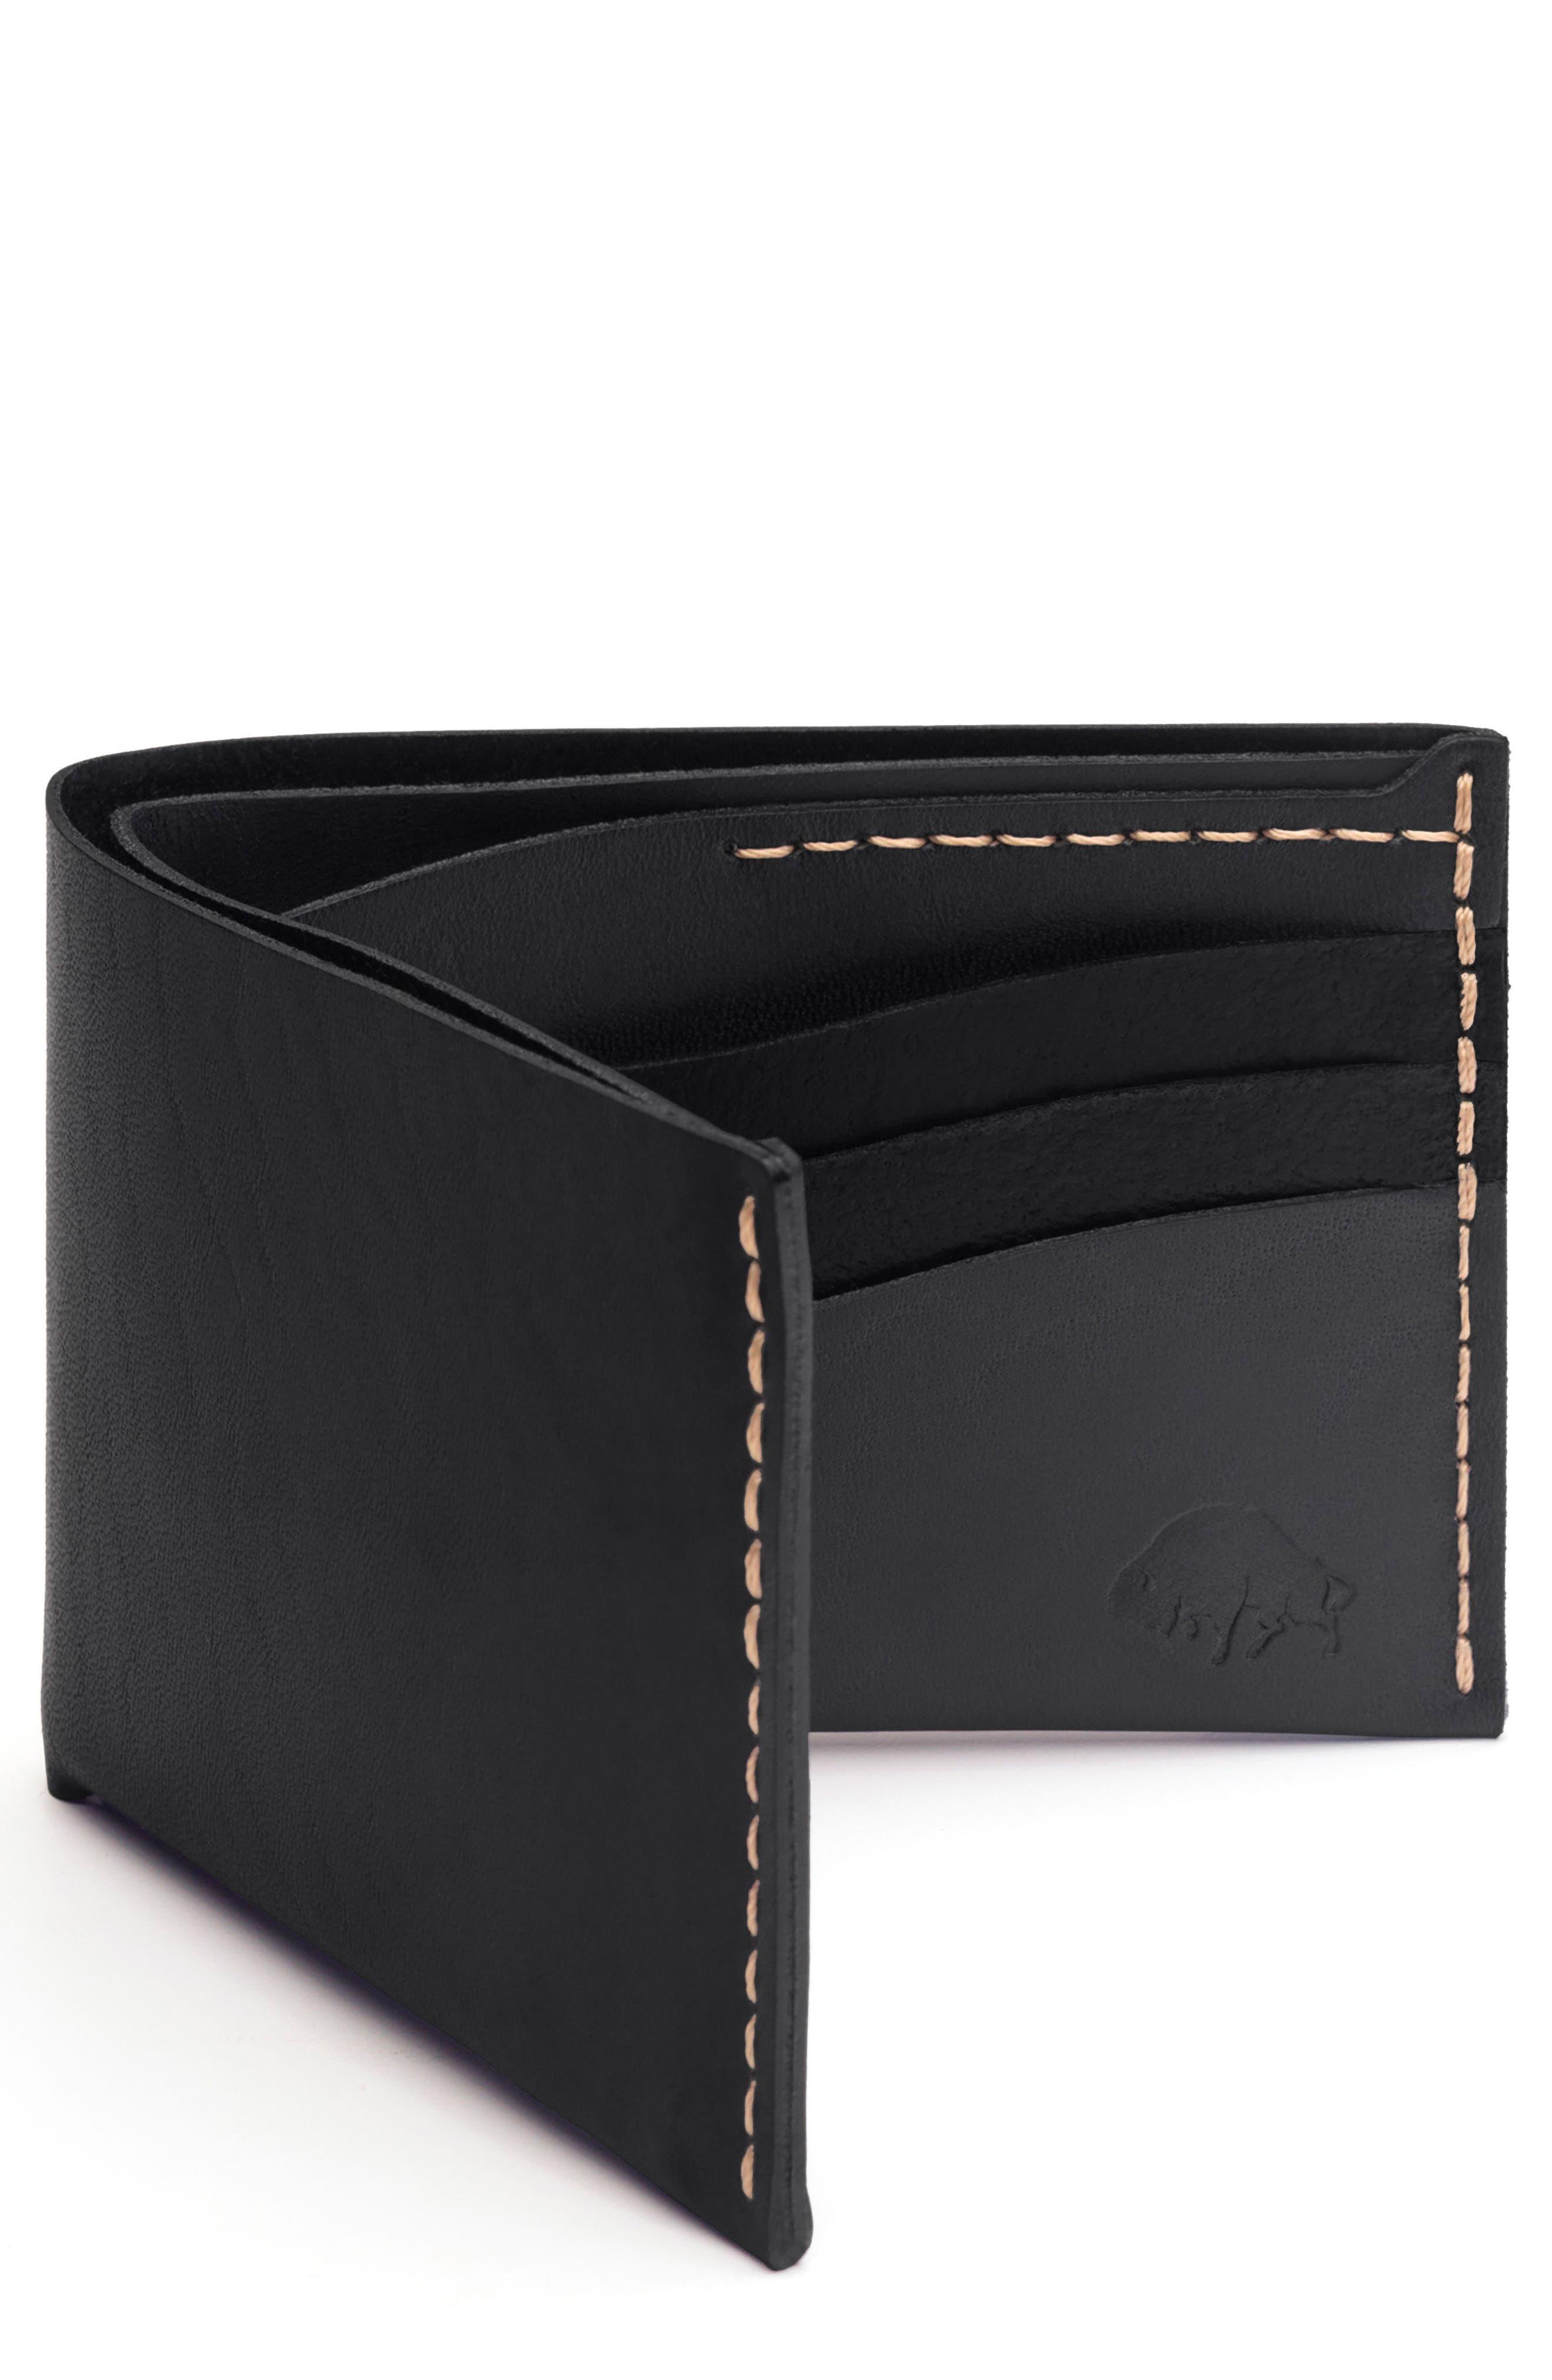 No. 8 Leather Wallet,                         Main,                         color, Jet Top Stitch